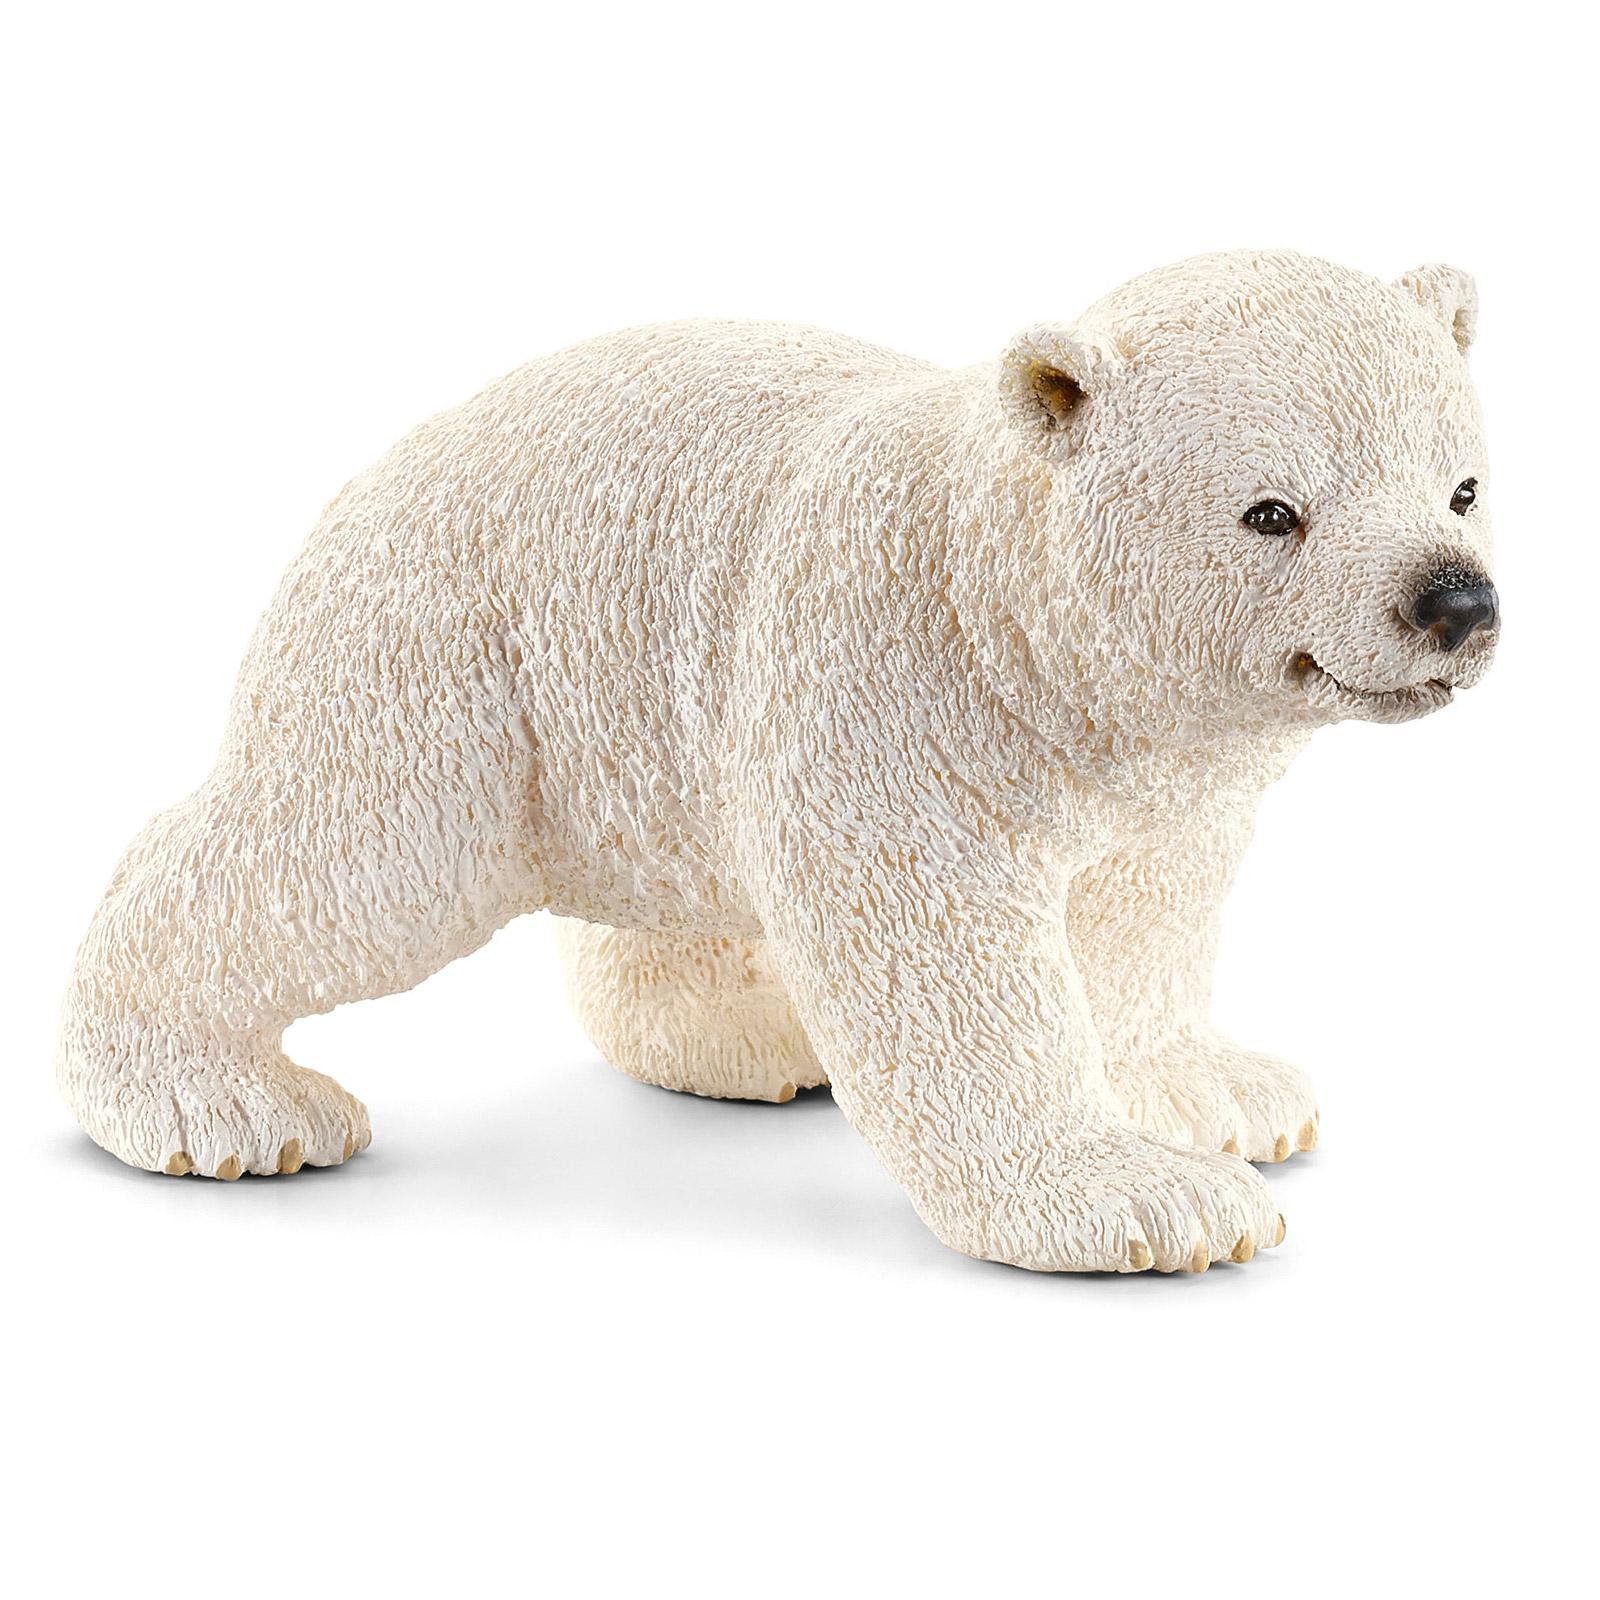 Фото - Фигурка Schleich Белый медвежонок 14708 фигурка lefard медвежонок 476 134 белый